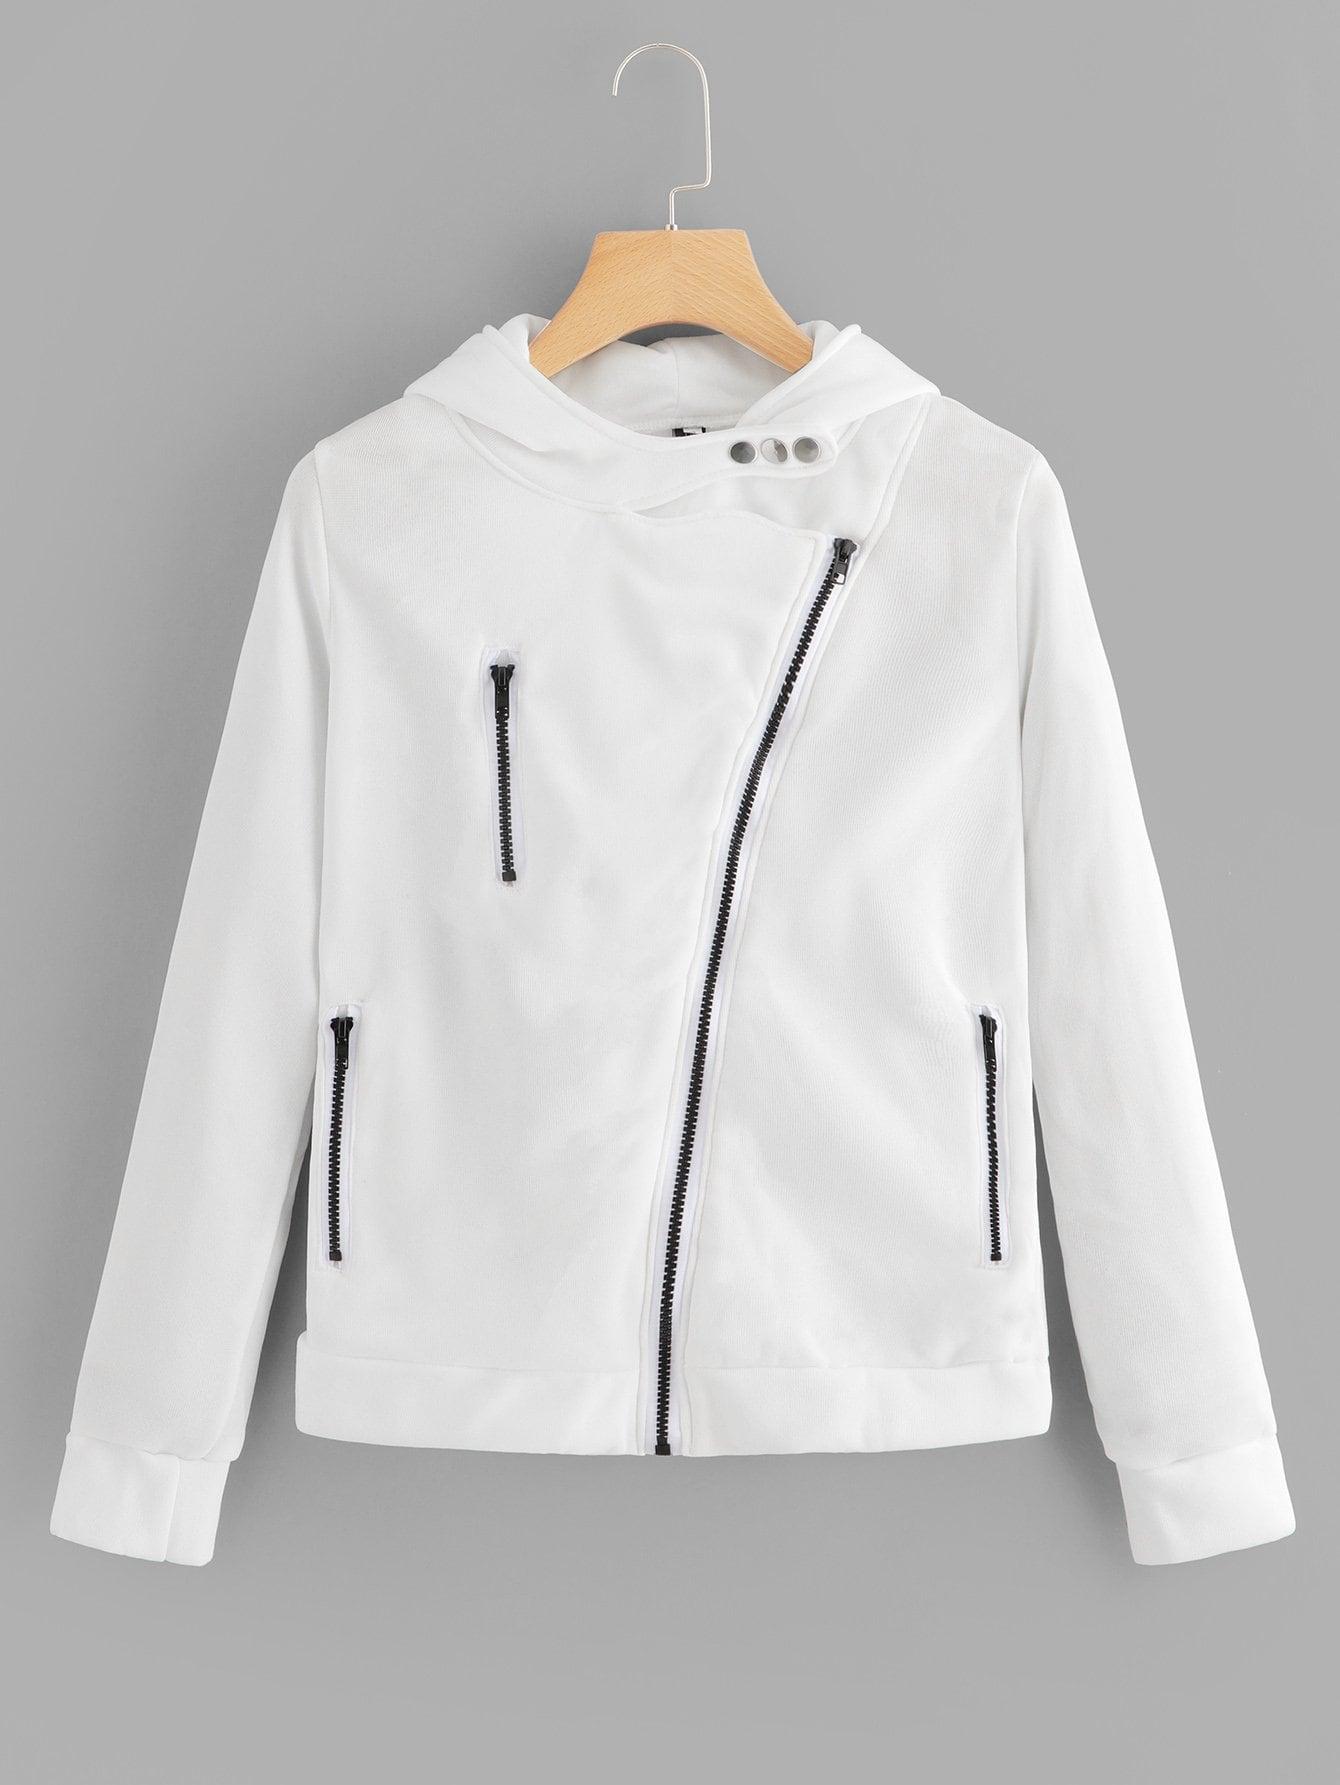 Button Detail Zip Up Jacket